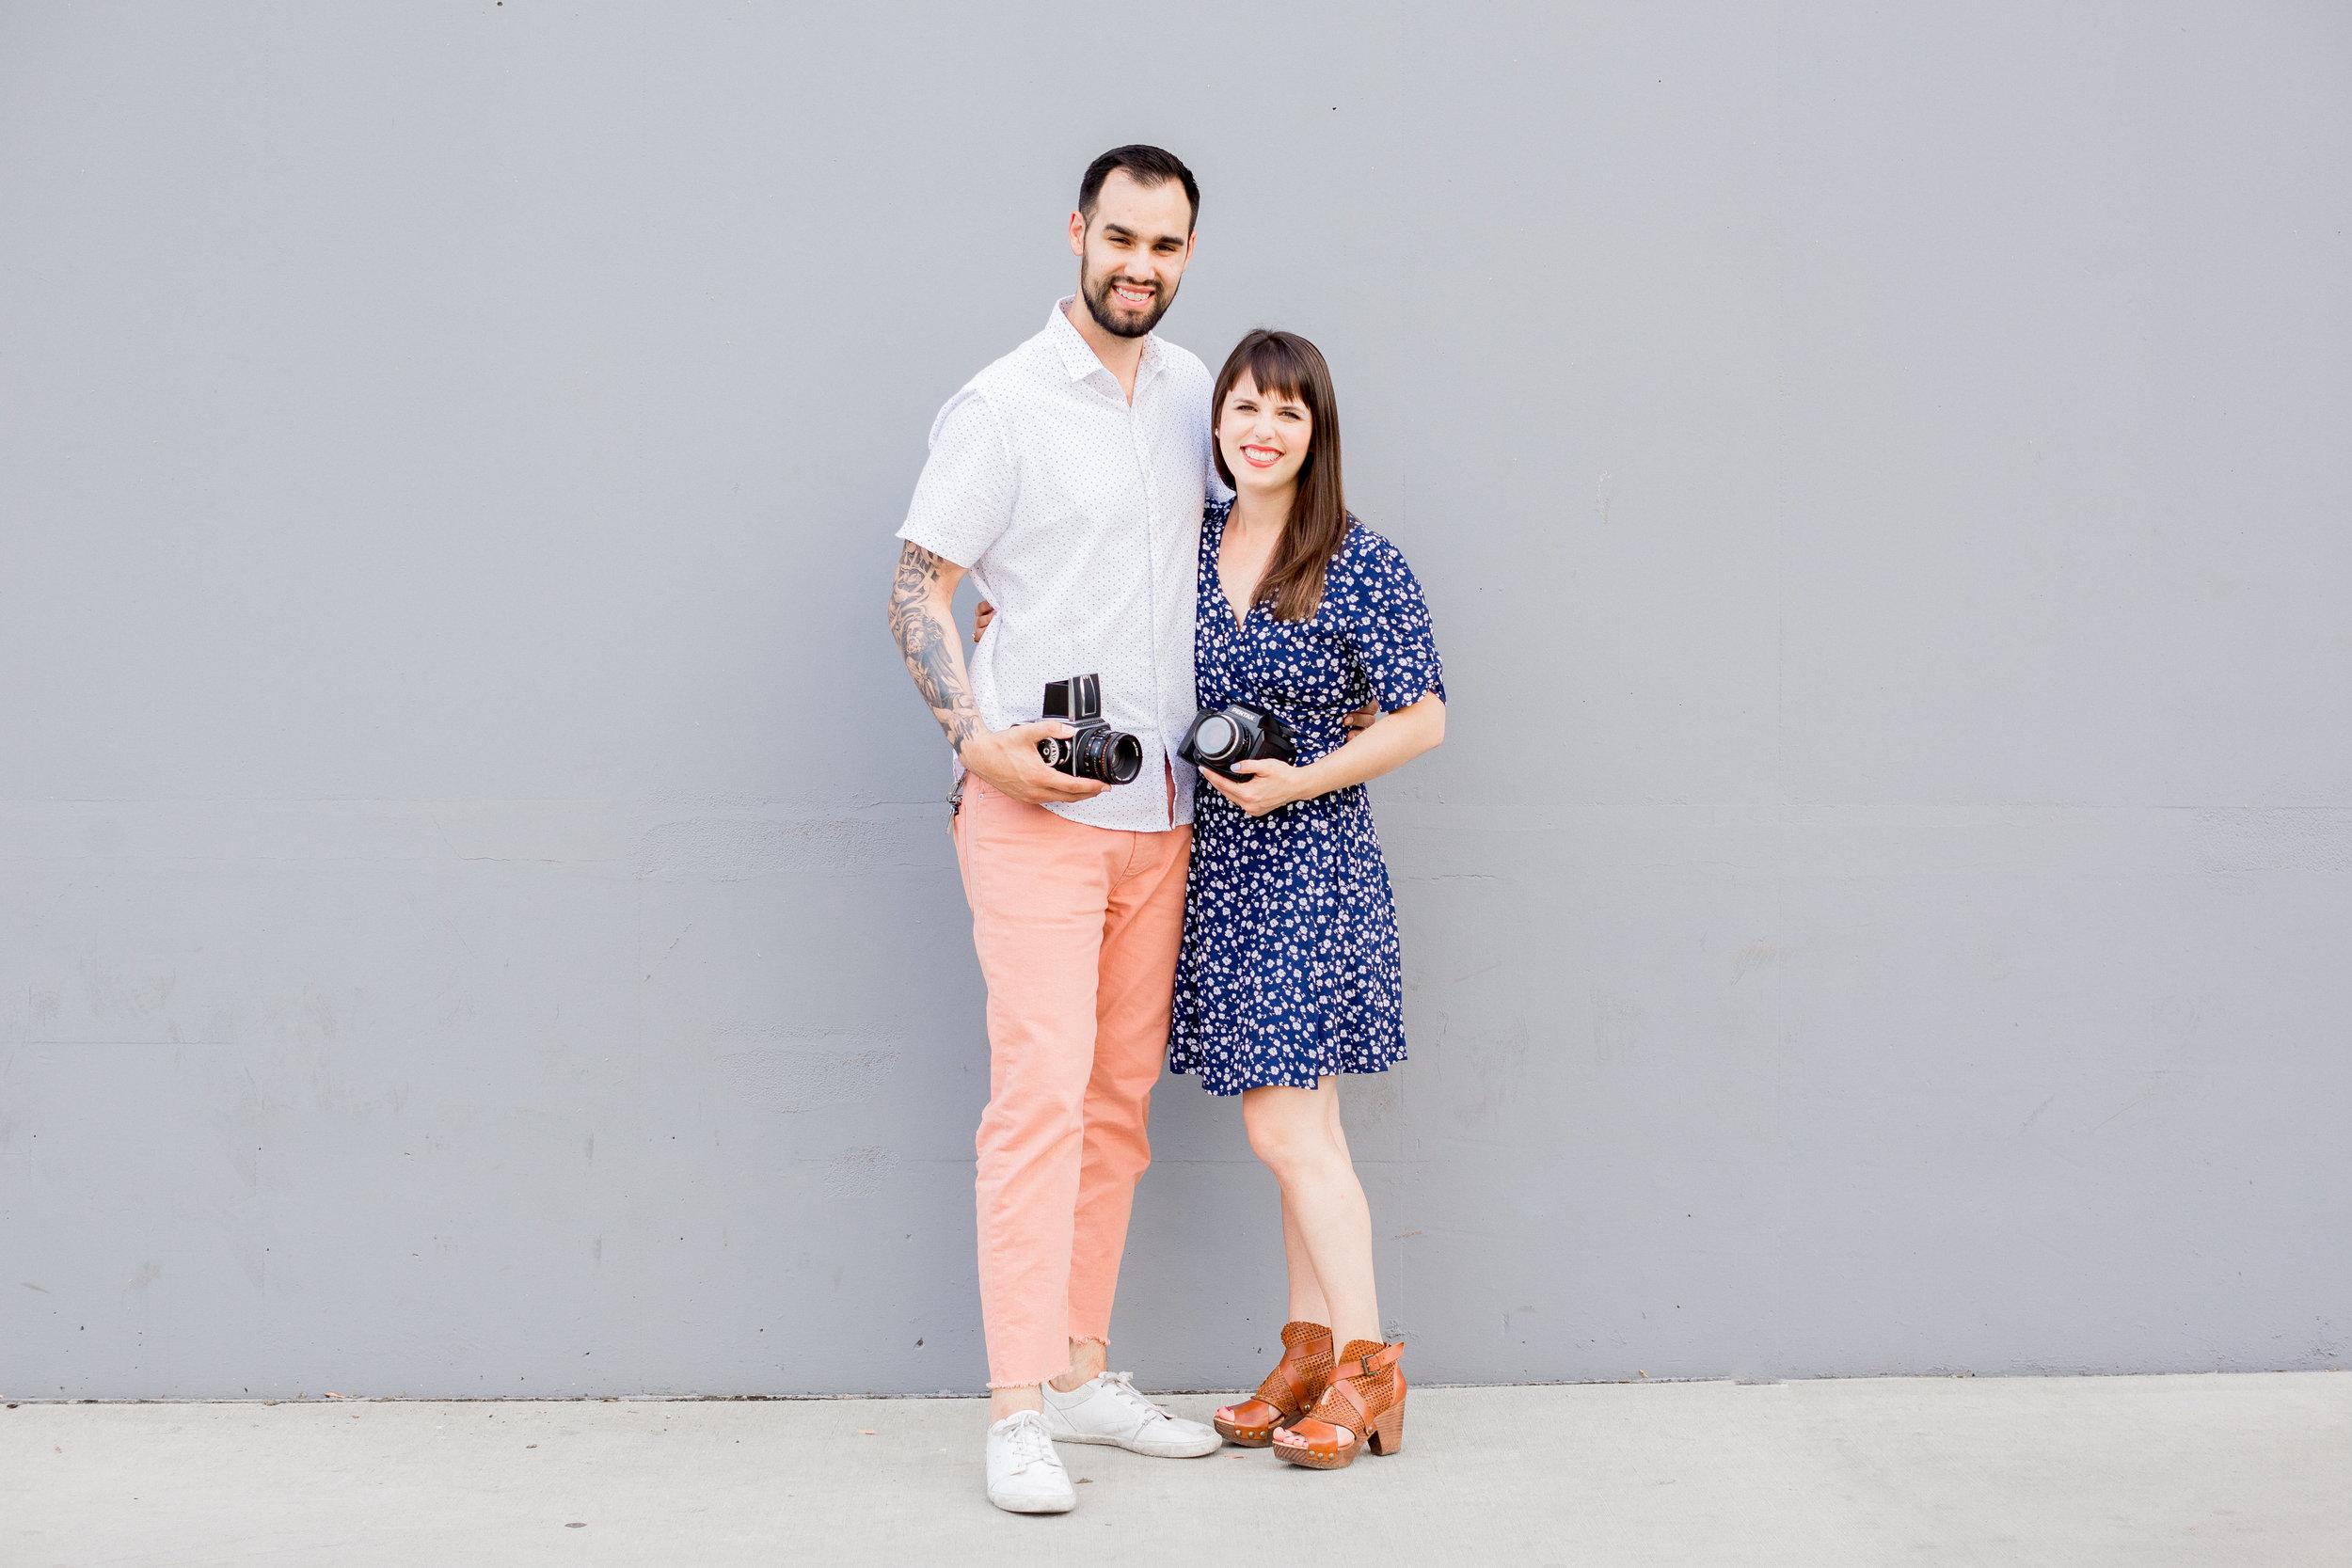 California-desination-wedding-photographers-and-videographersjpg